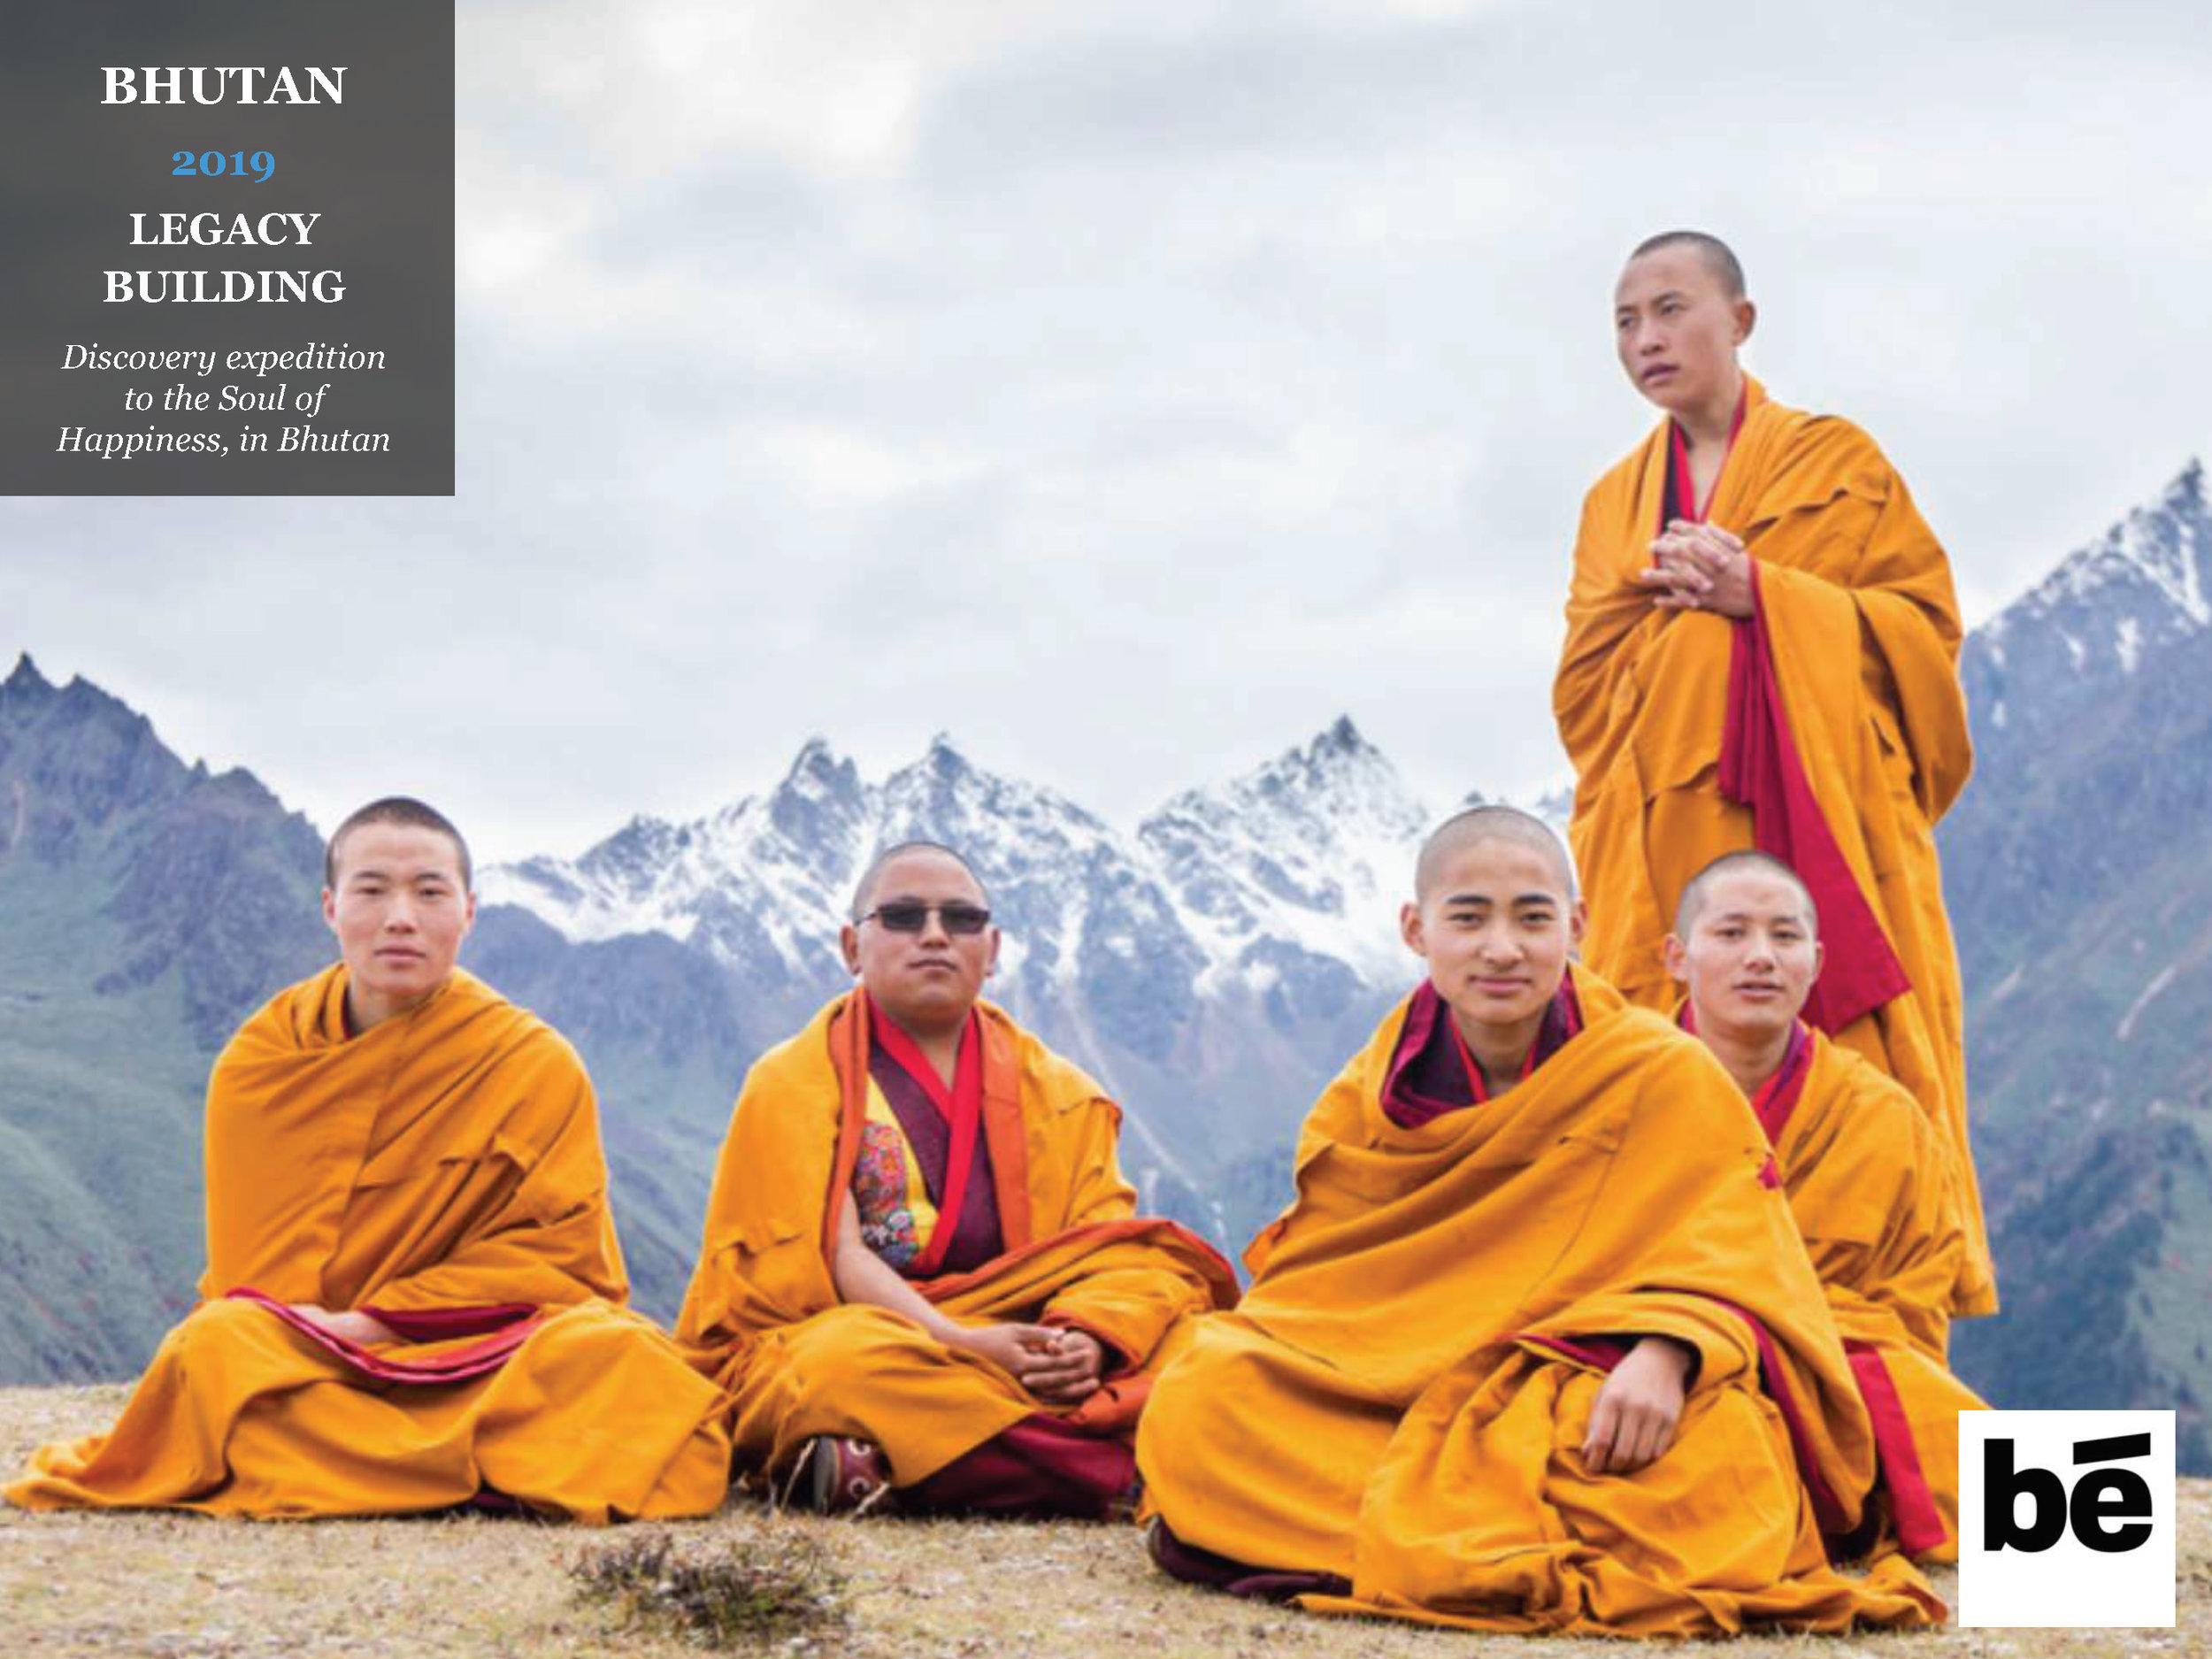 Bé_Bhutan_Page_01.jpg